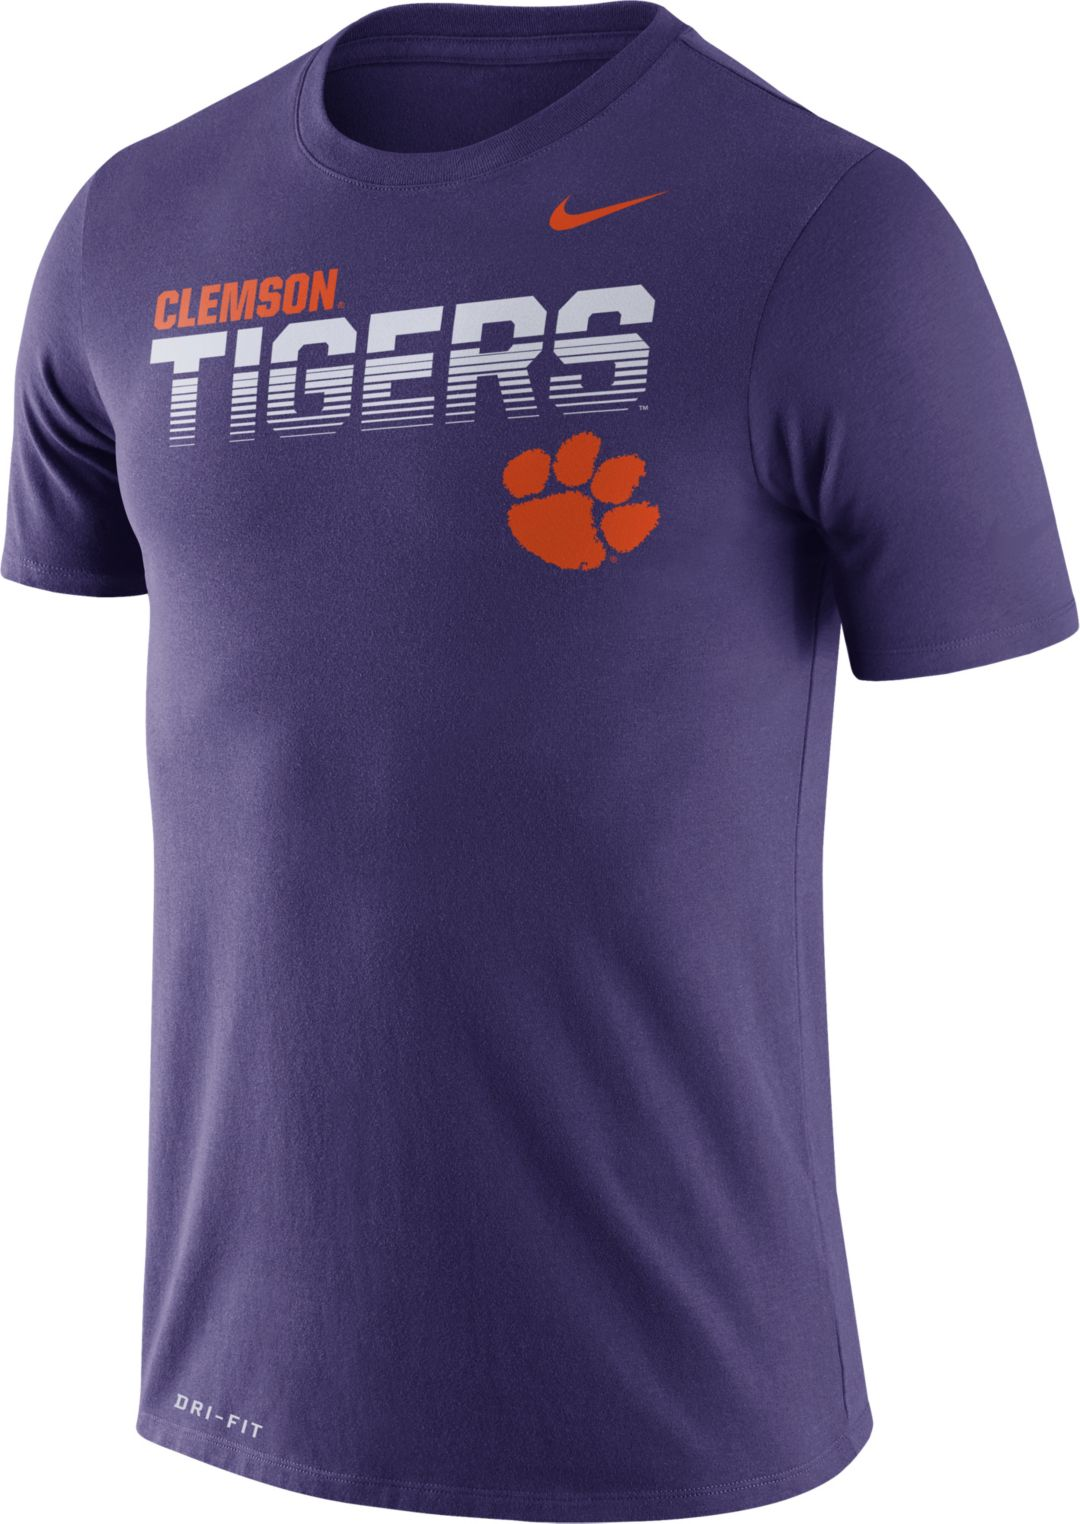 buy popular 34f41 53ee5 Nike Men's Clemson Tigers Purple Legend Football Sideline T-Shirt